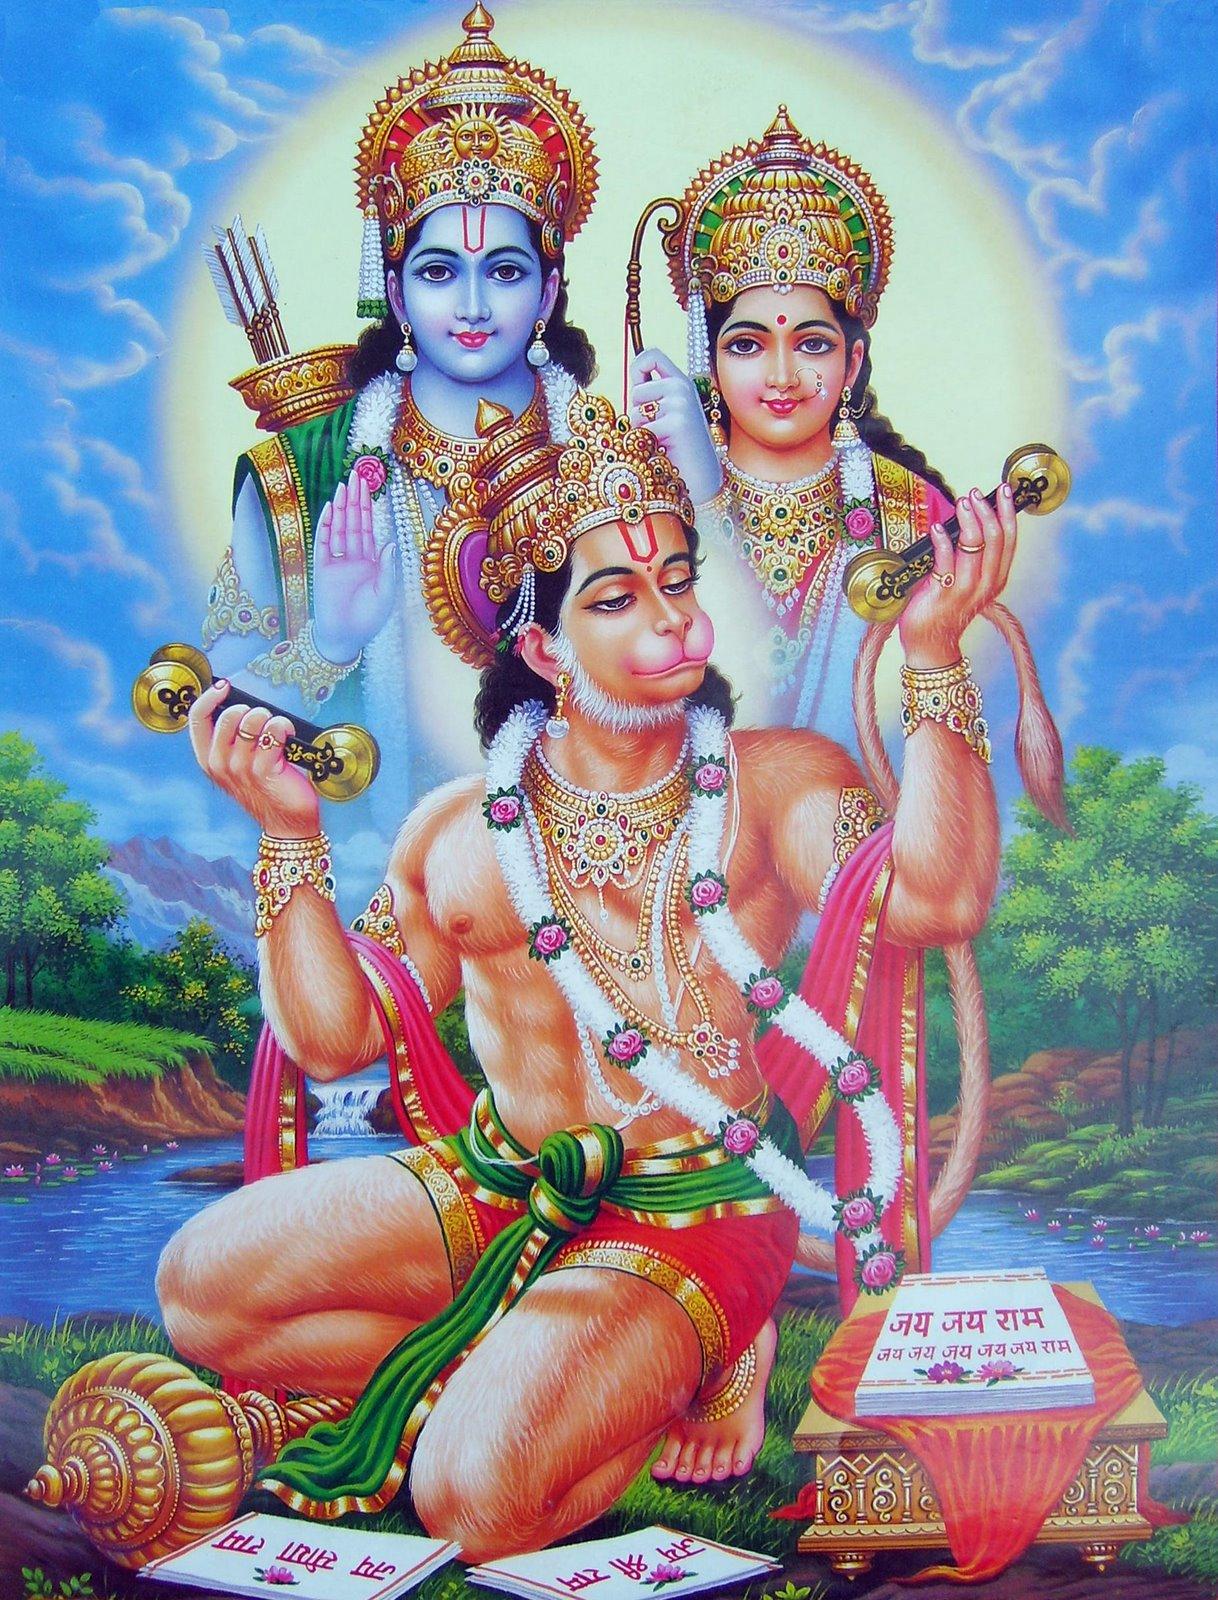 ... wallpapers, beautiful wallpapers, Lord Hanuman photos, Lord Hanuman